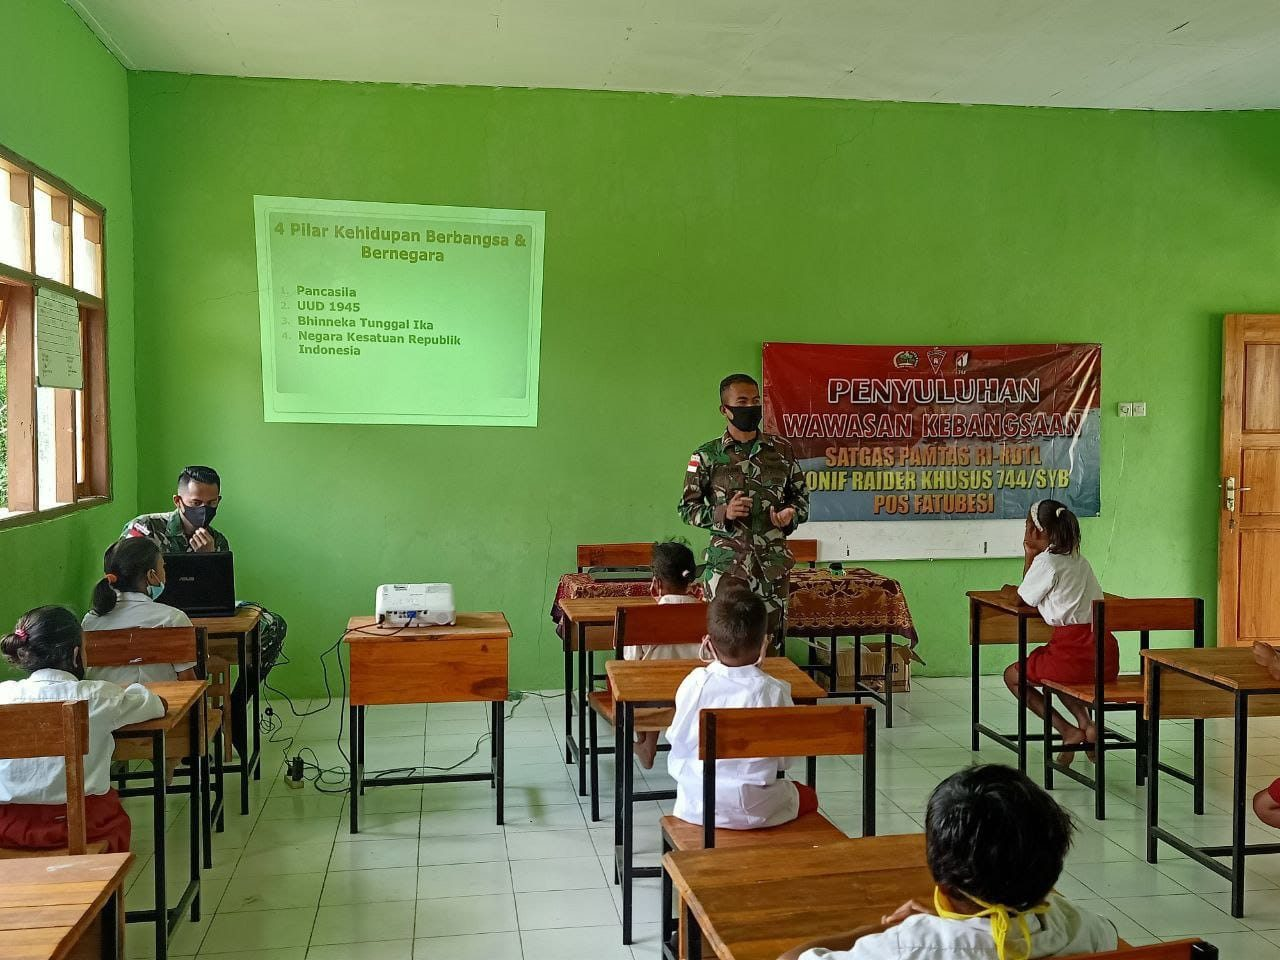 Tanamkan Rasa Cinta Tanah Air, Satgas Yonif RK 744 Berikan Wawasan Kebangsaan di Sekolah Perbatasan